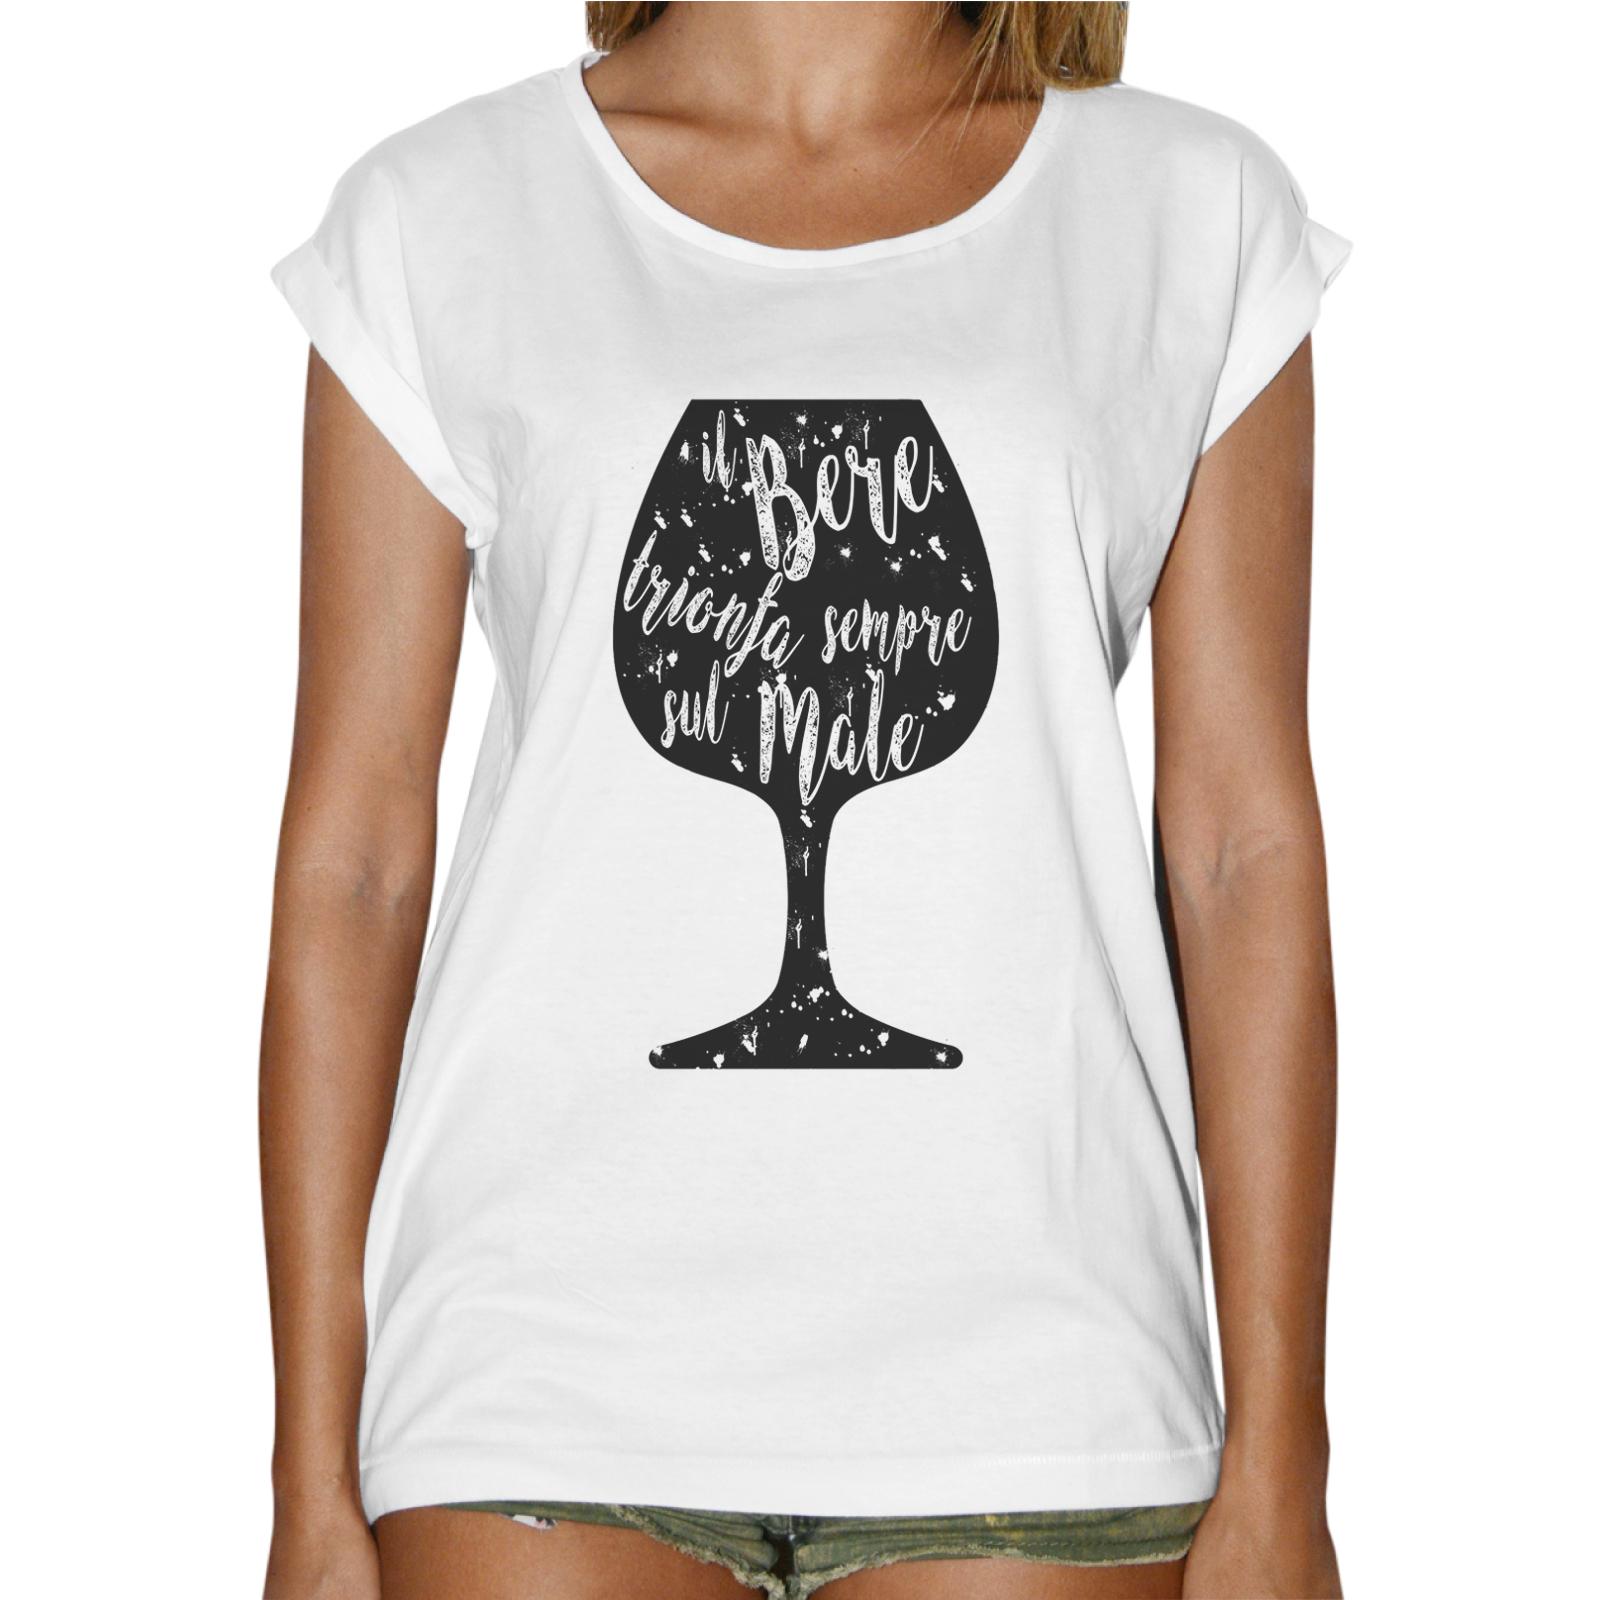 T-Shirt Donna Fashion IL BERE TRIONFA